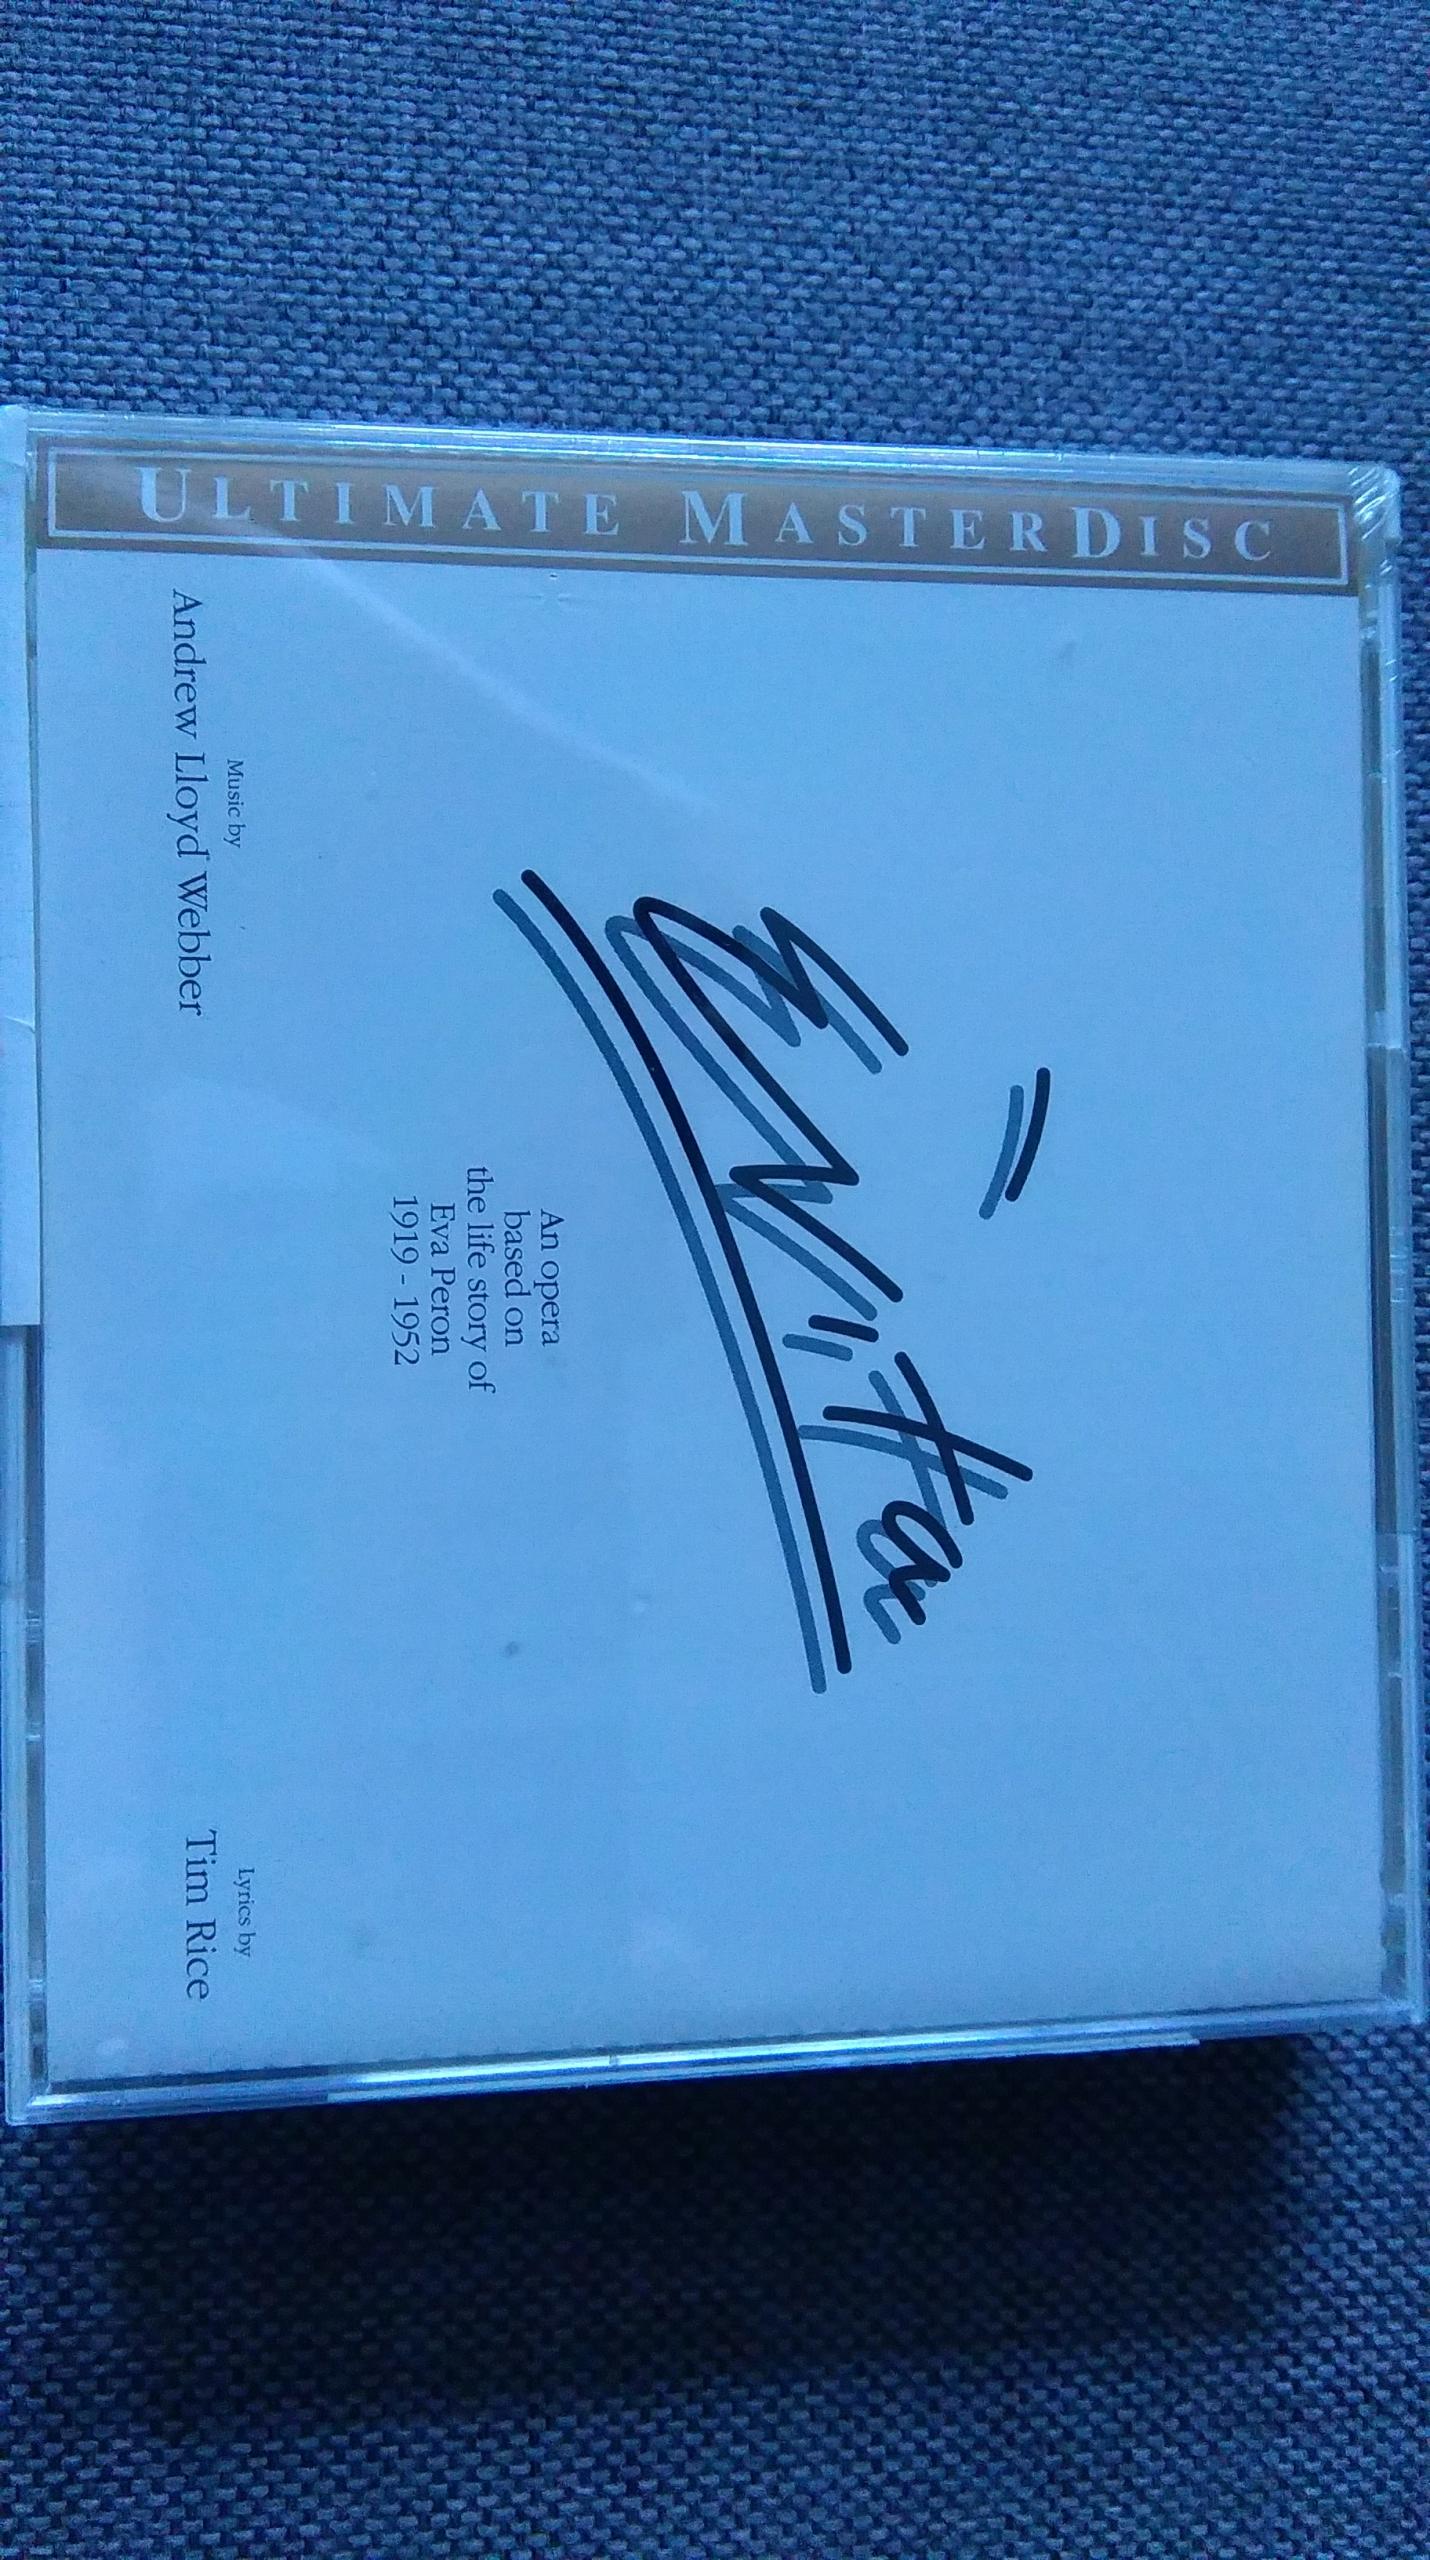 Andrew Lloyd Webber -Evita 2cd Gold MCA Masterdisc